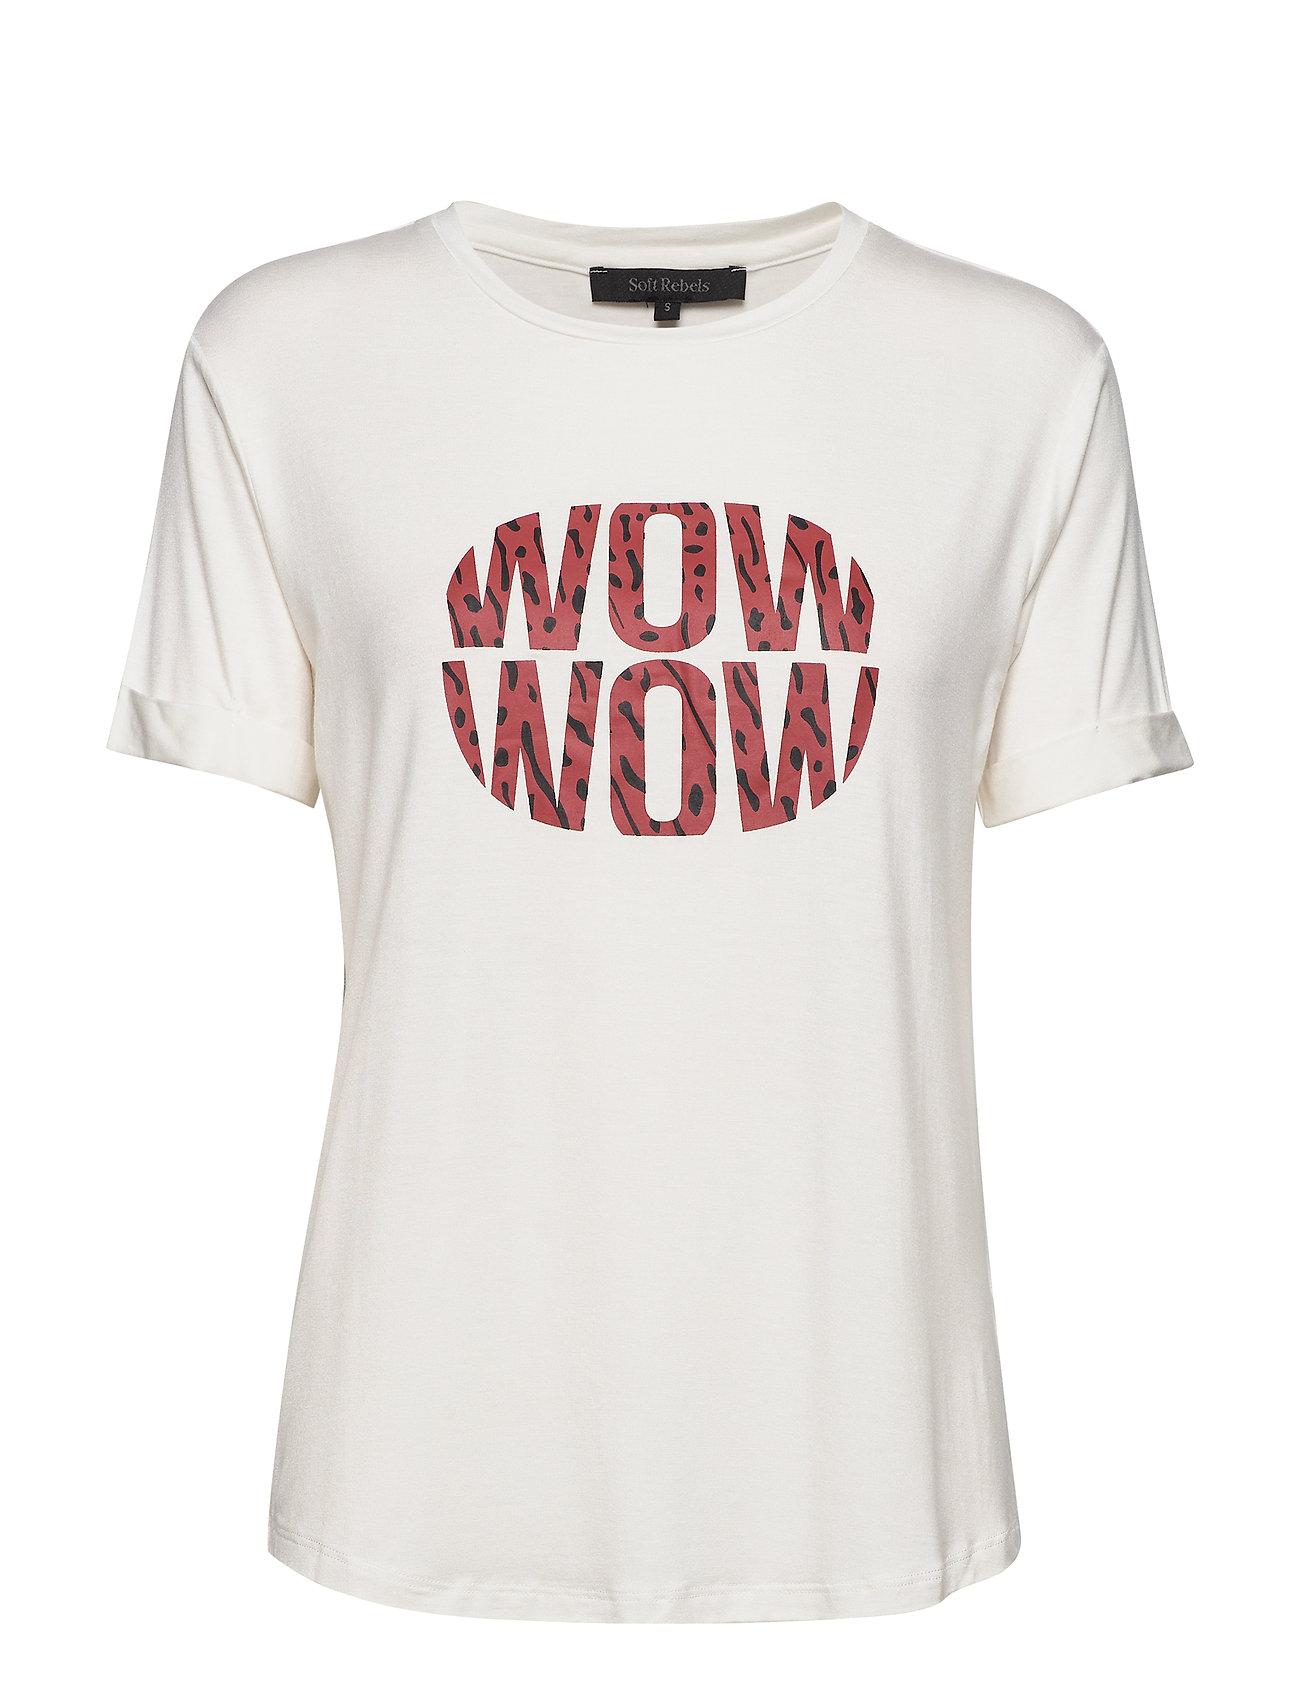 Soft Rebels Wow T-shirt - SNOW WHITE / OFF WHITE